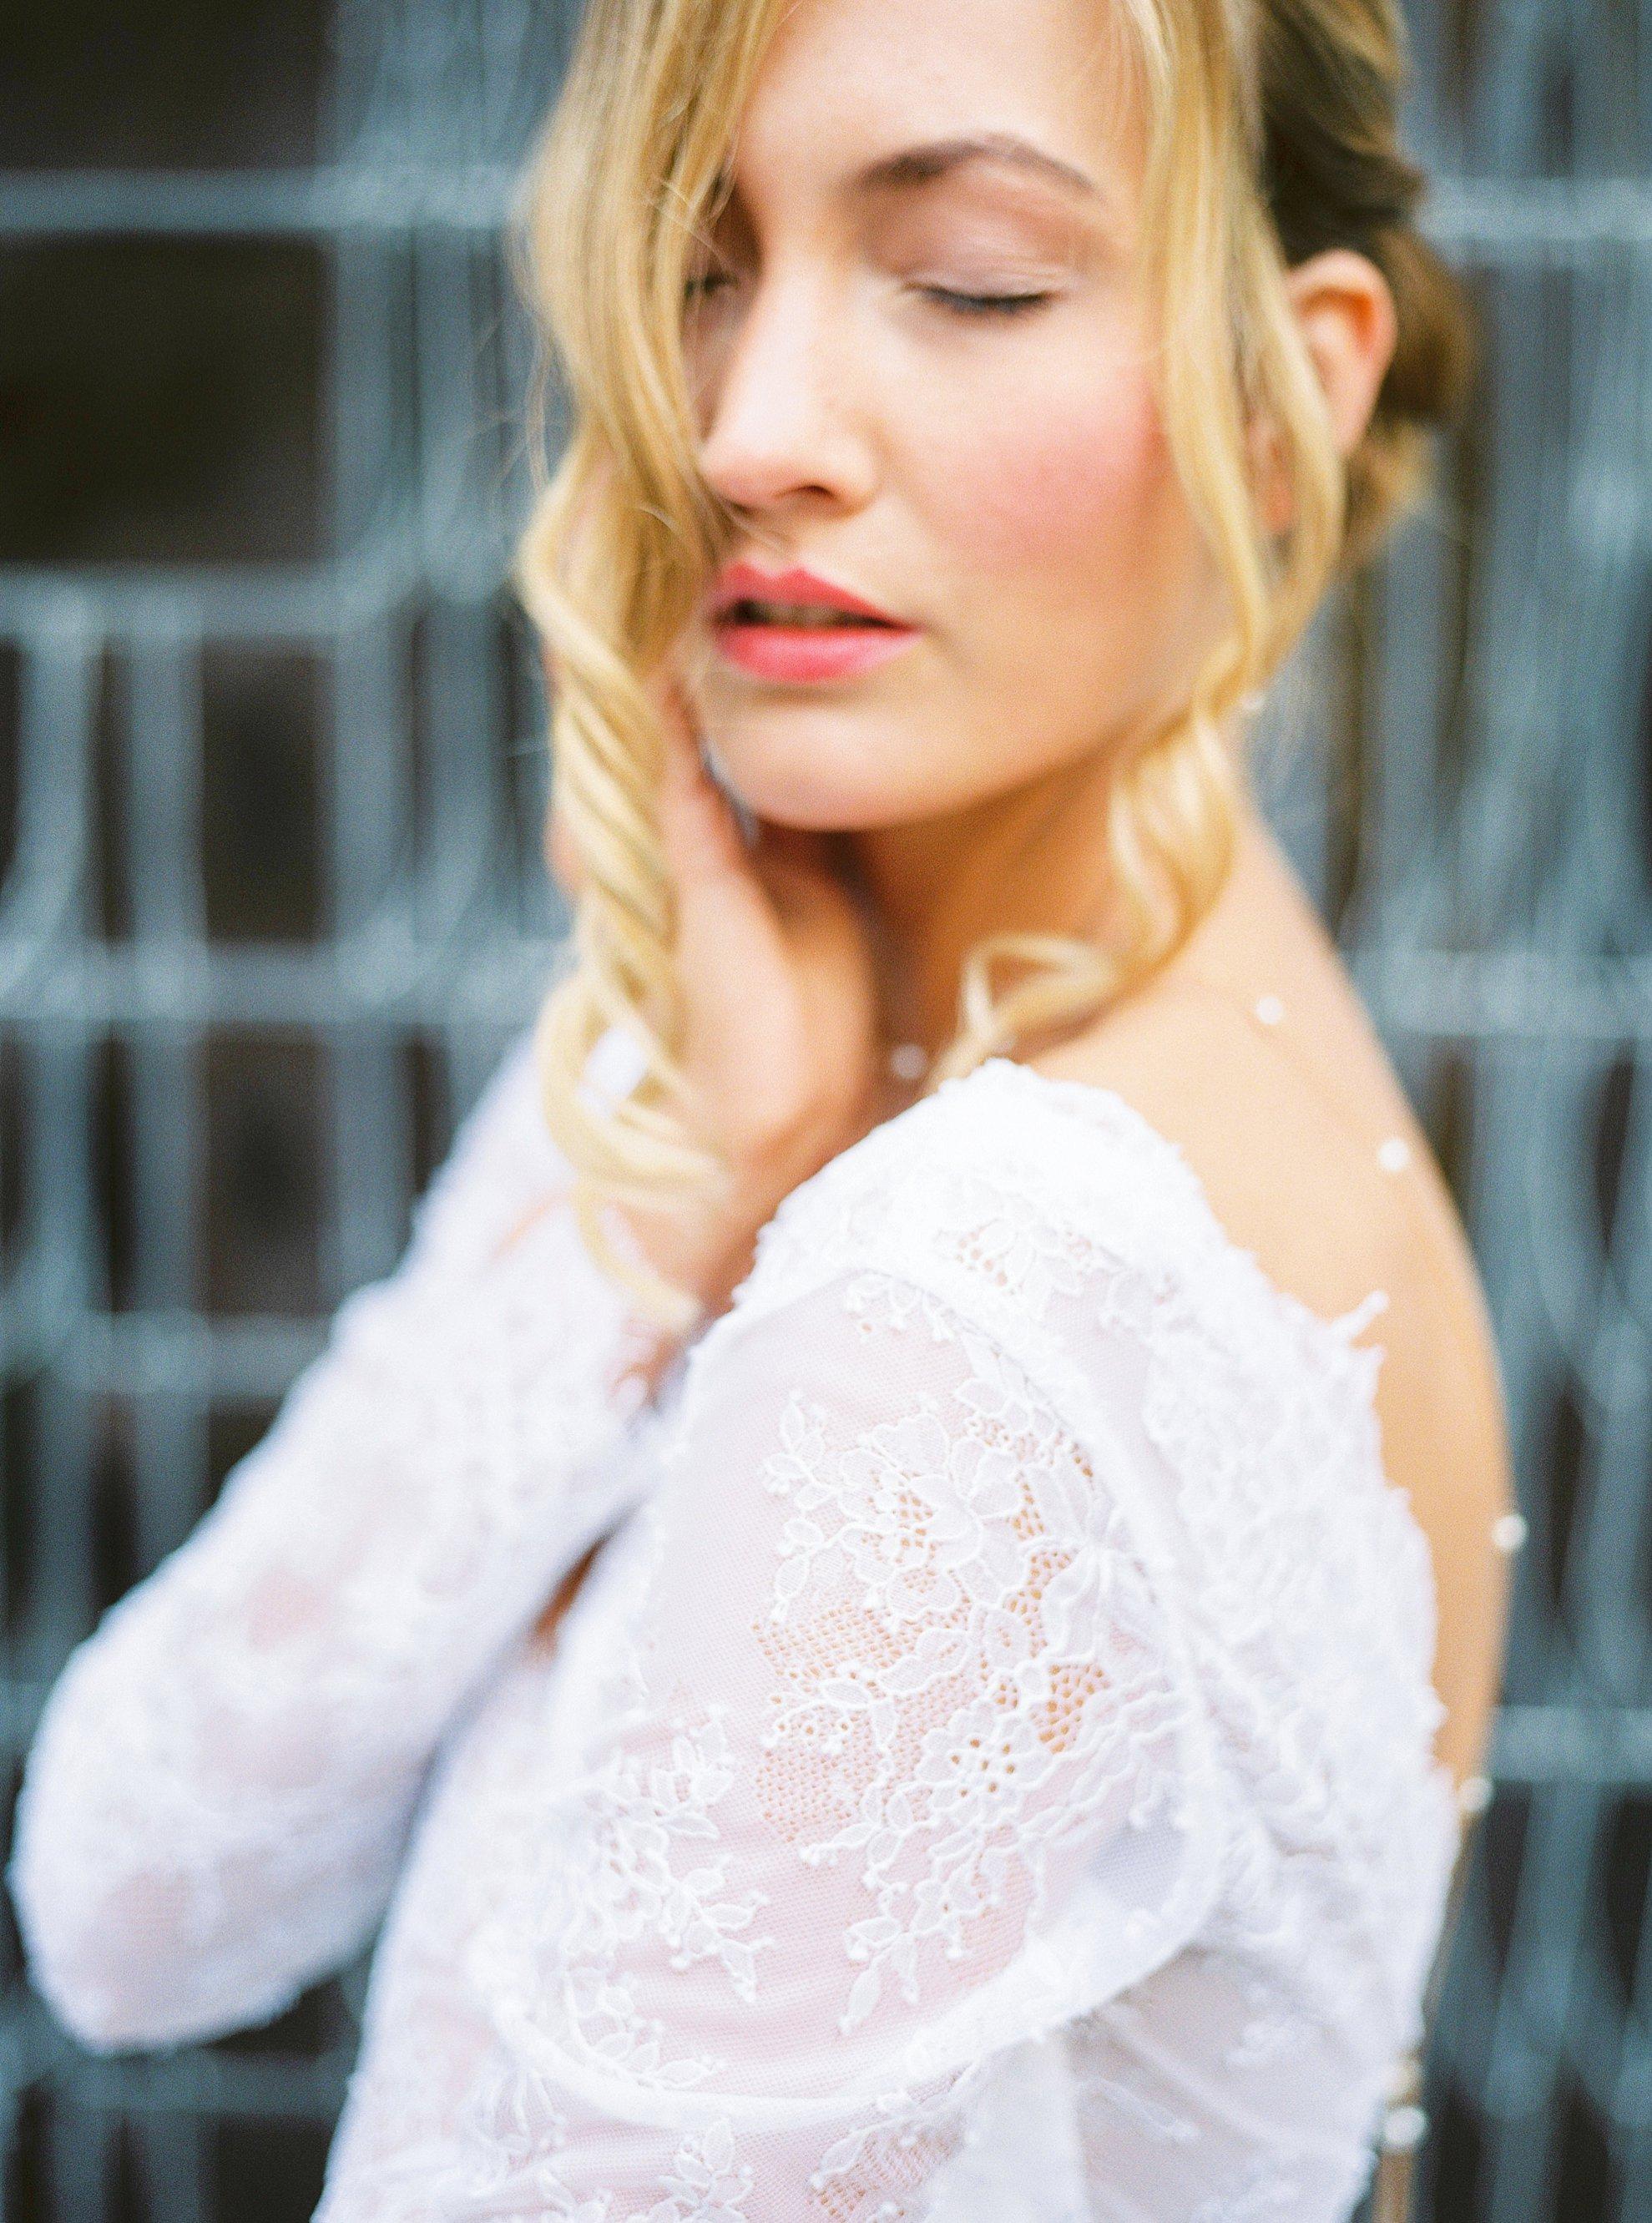 Amanda-Drost-Photography-fotografie-bruiloft-trouwen-winter-TheNetherlands_0079.jpg